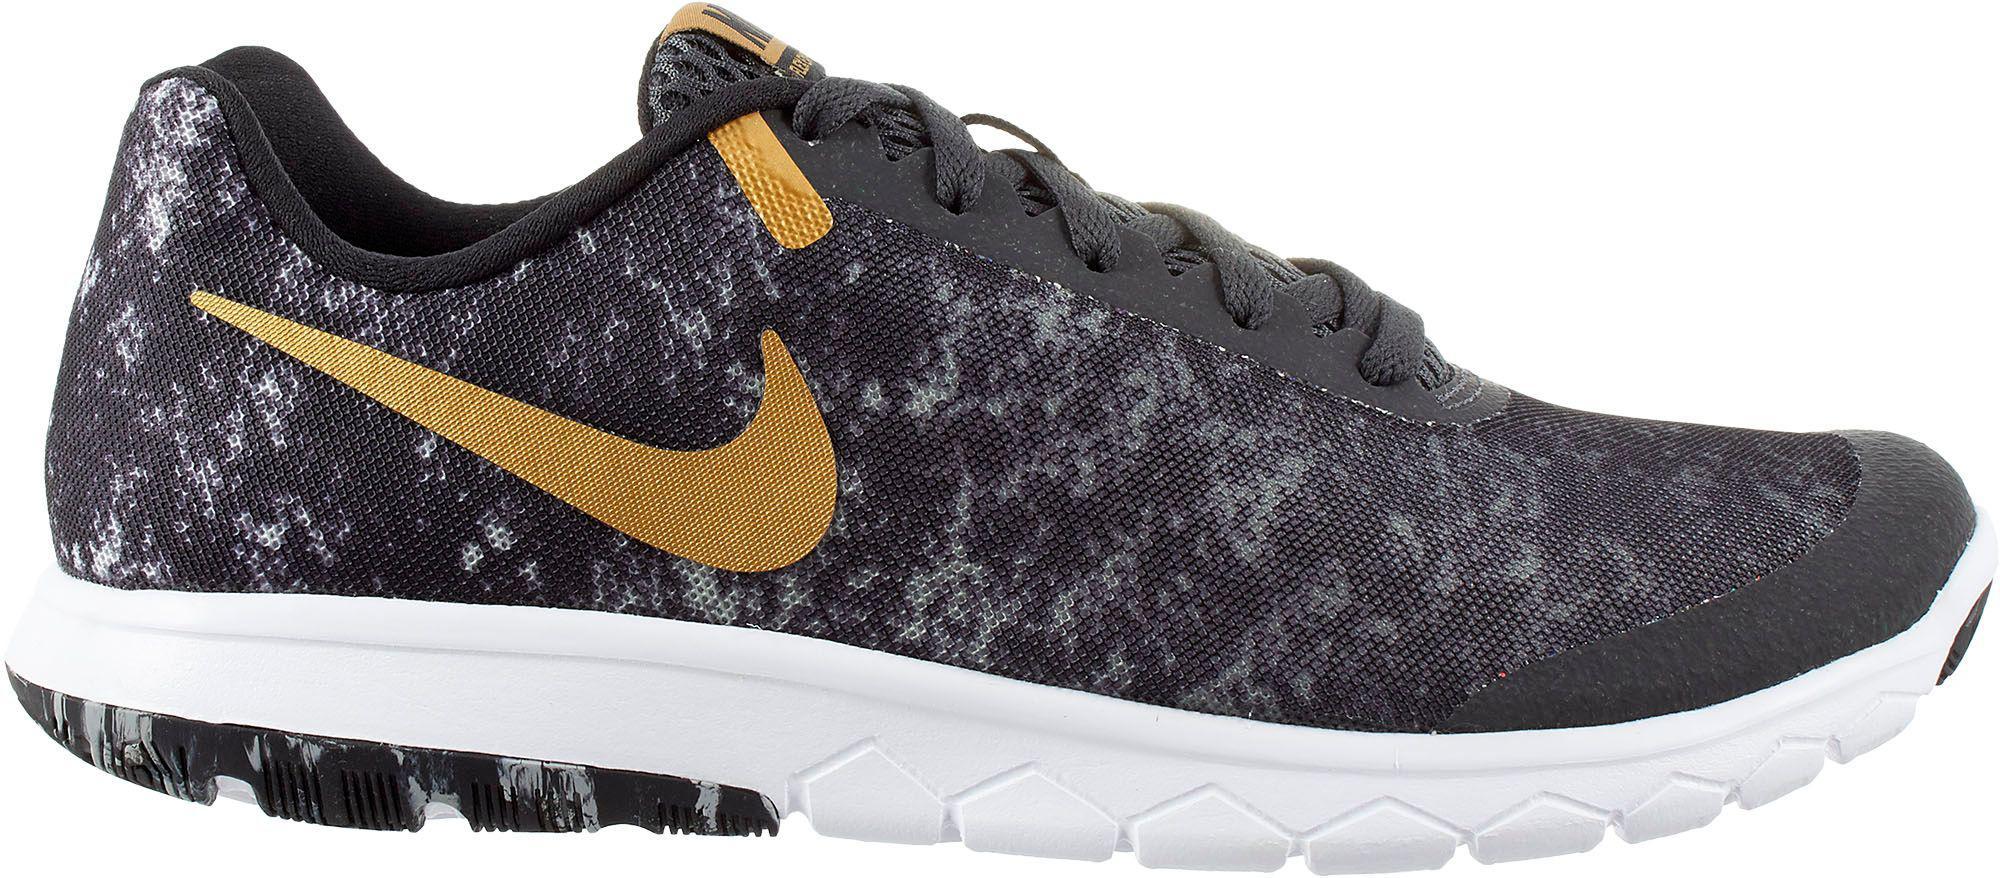 5af56d9d304b Lyst - Nike Flex Experience Rn 6 Premium Running Shoes in Black for Men